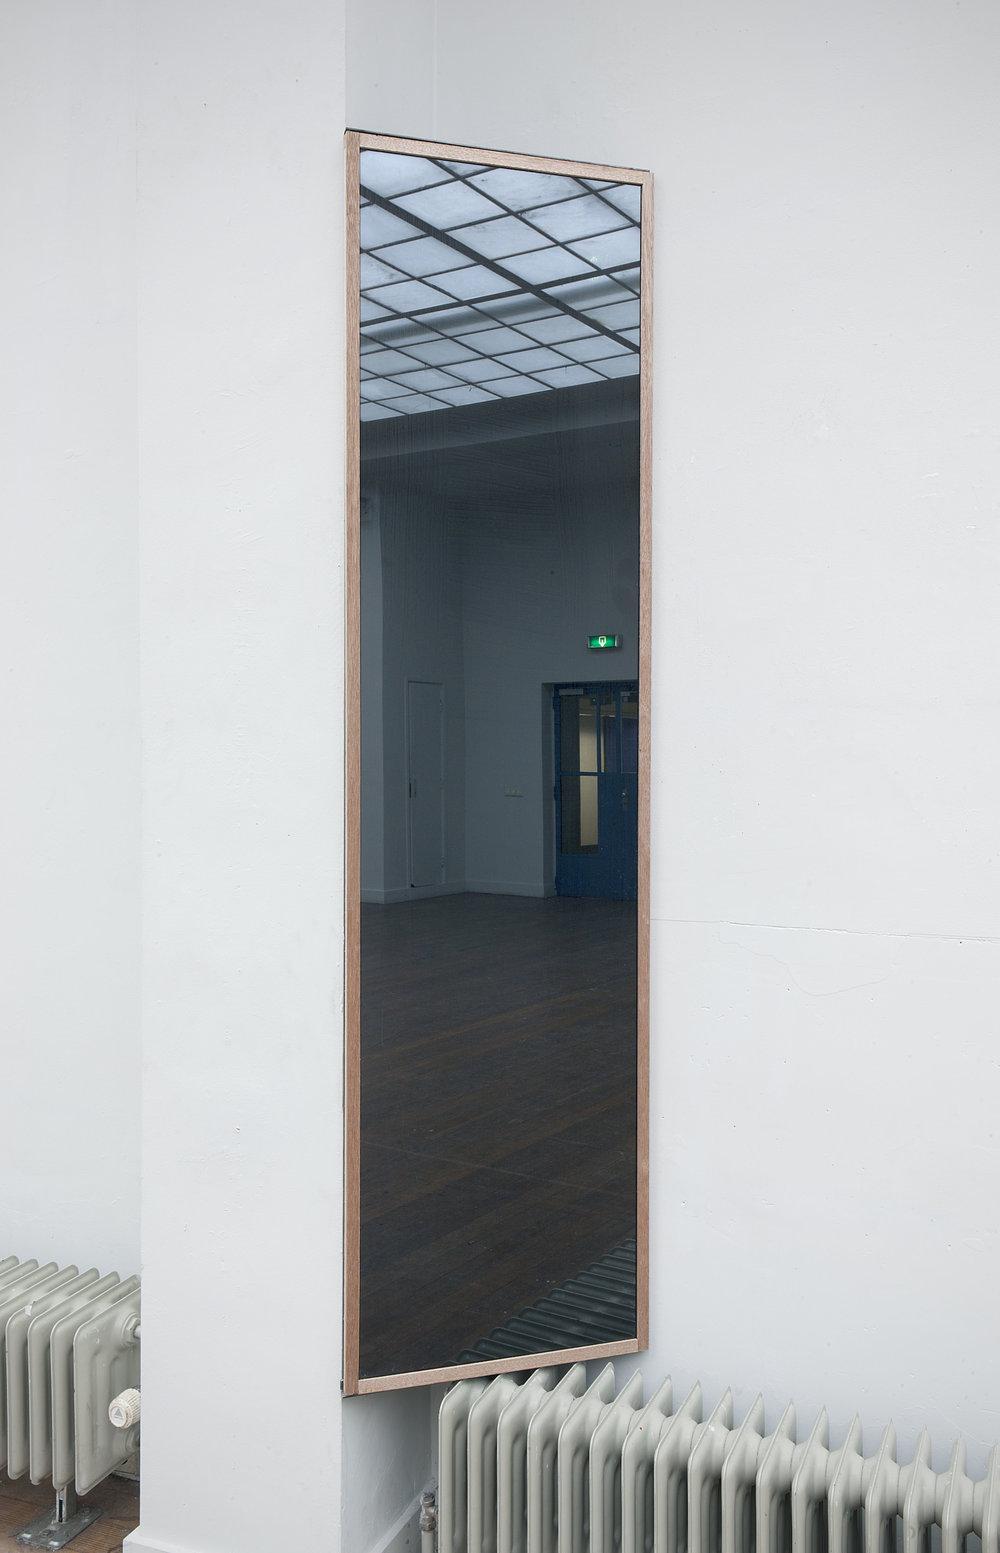 002.KEES VAN LEEUWEN -KON.AC.DEN HAAG 2012-PH.GJ.vanROOIJ.jpg